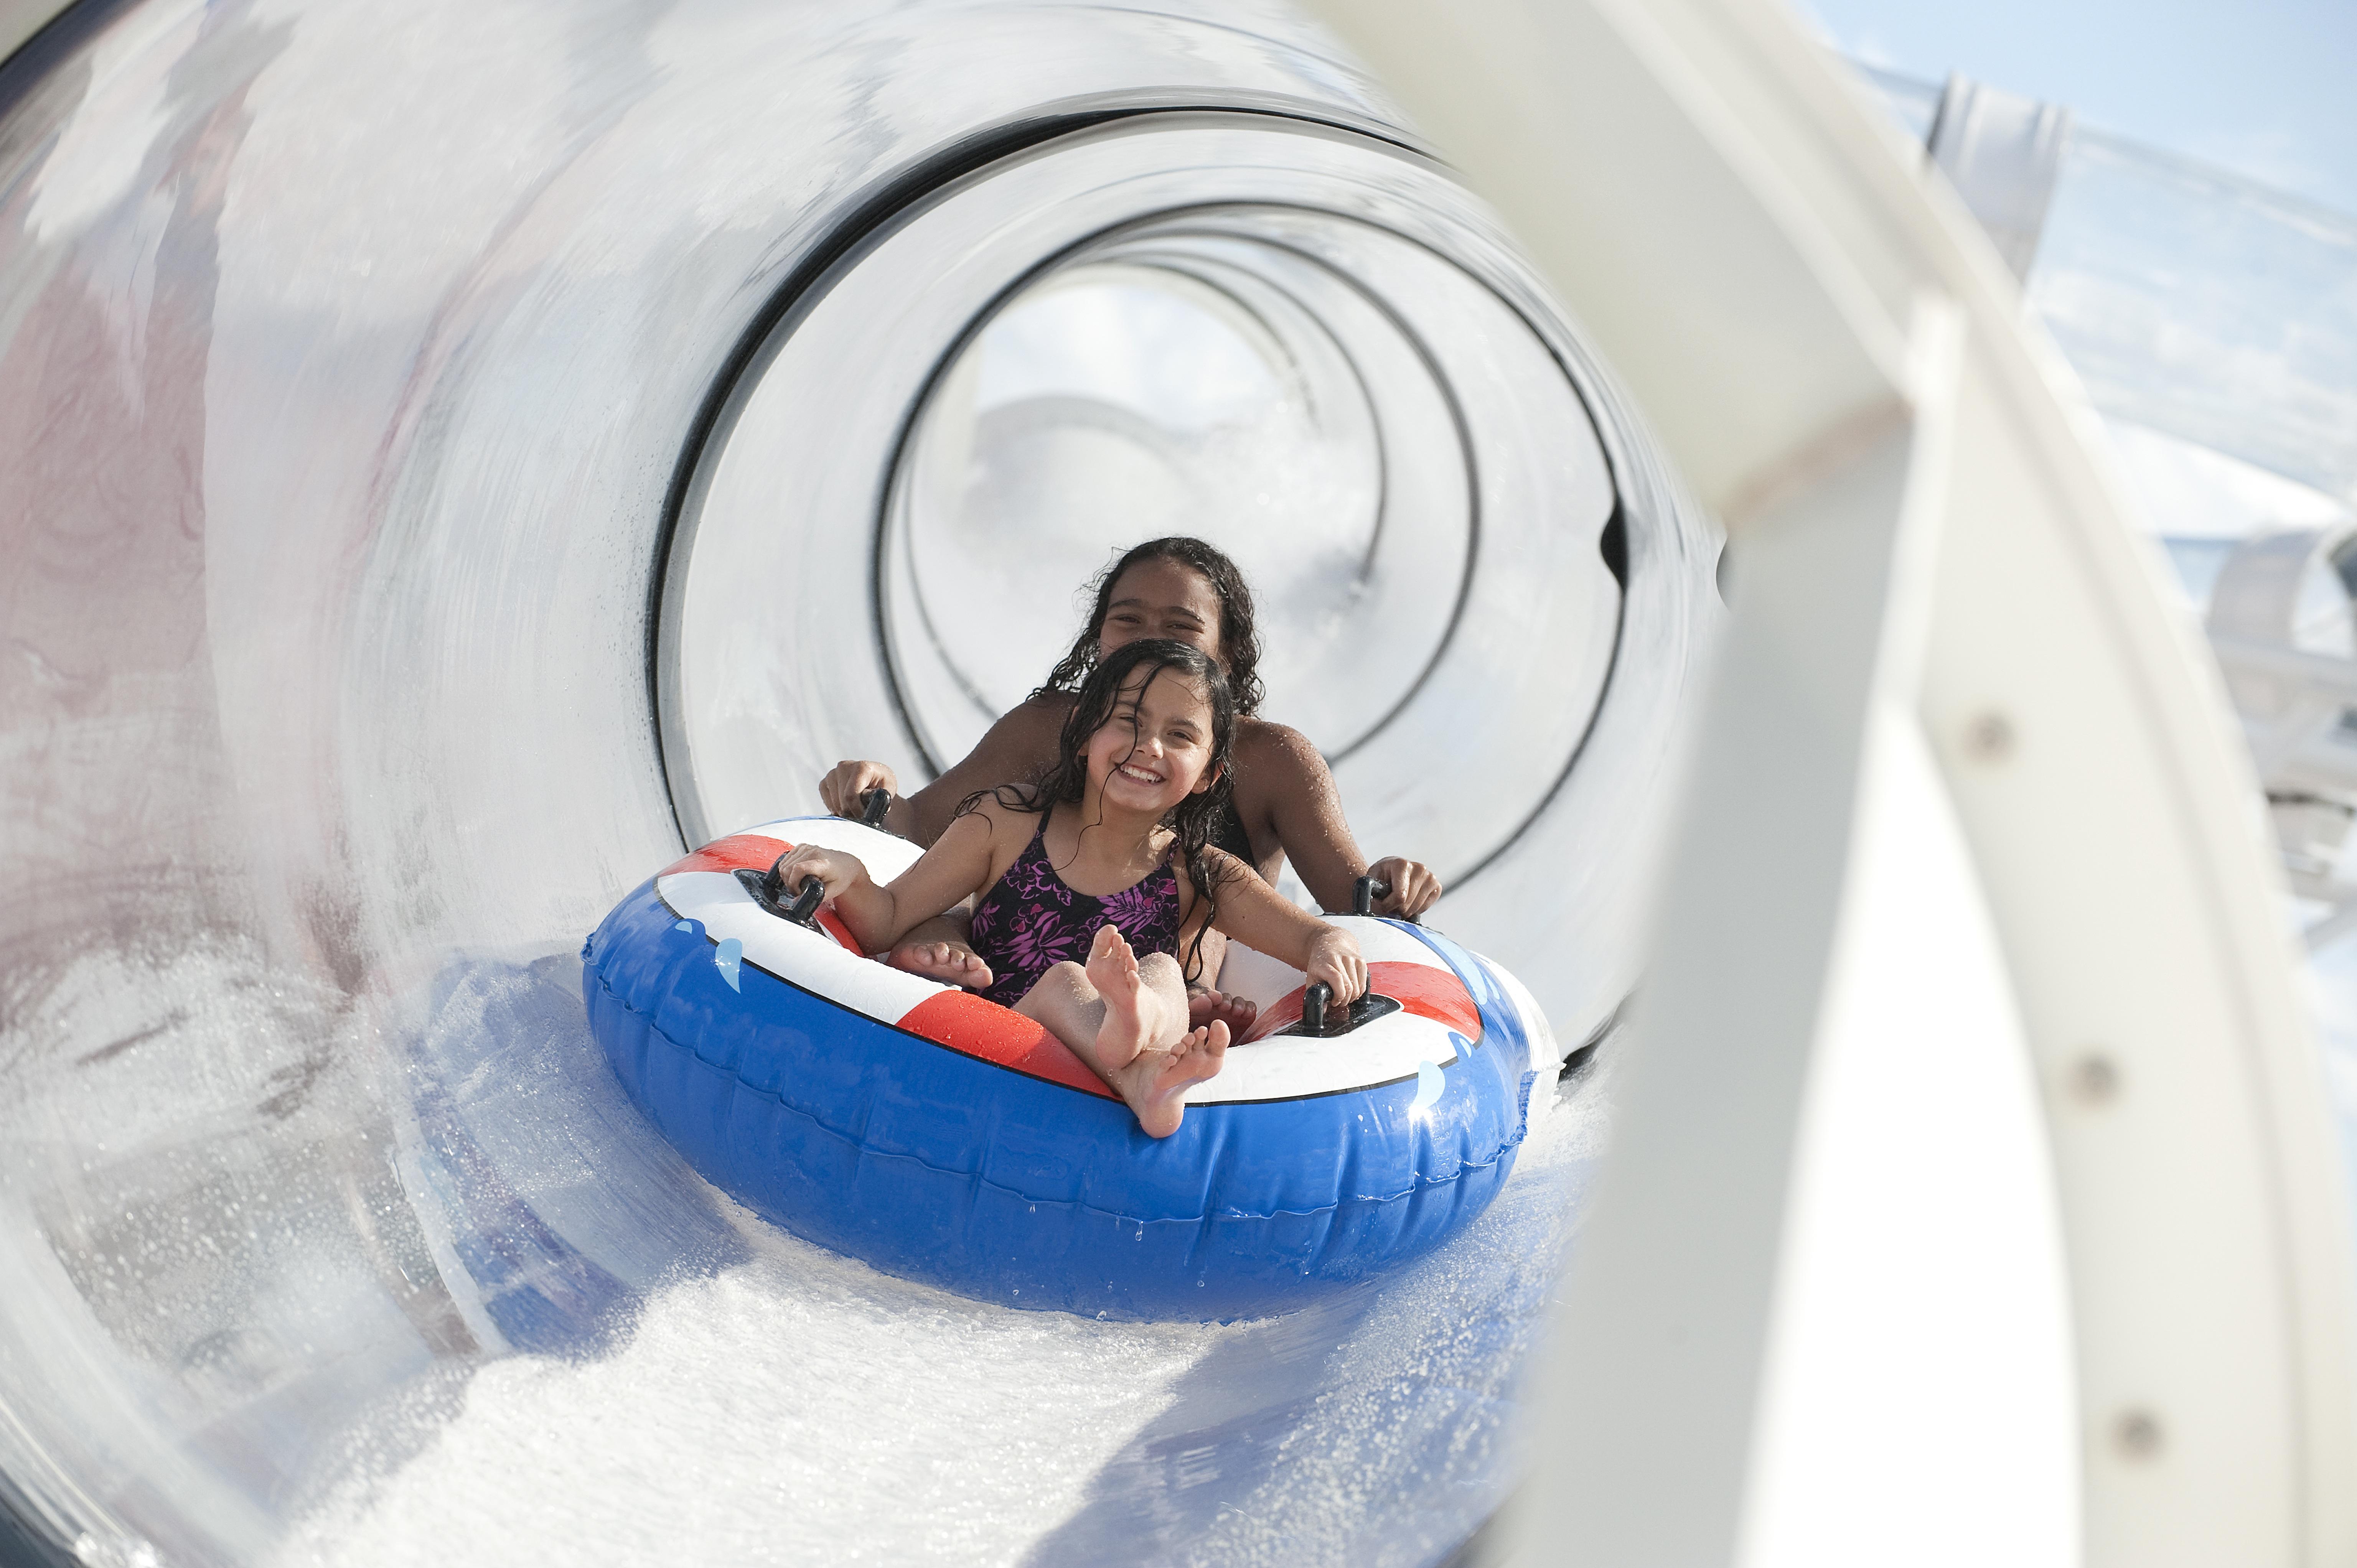 Disney Cruise Line Disney Dream Exterior AquaDuck water coaster 1.jpg